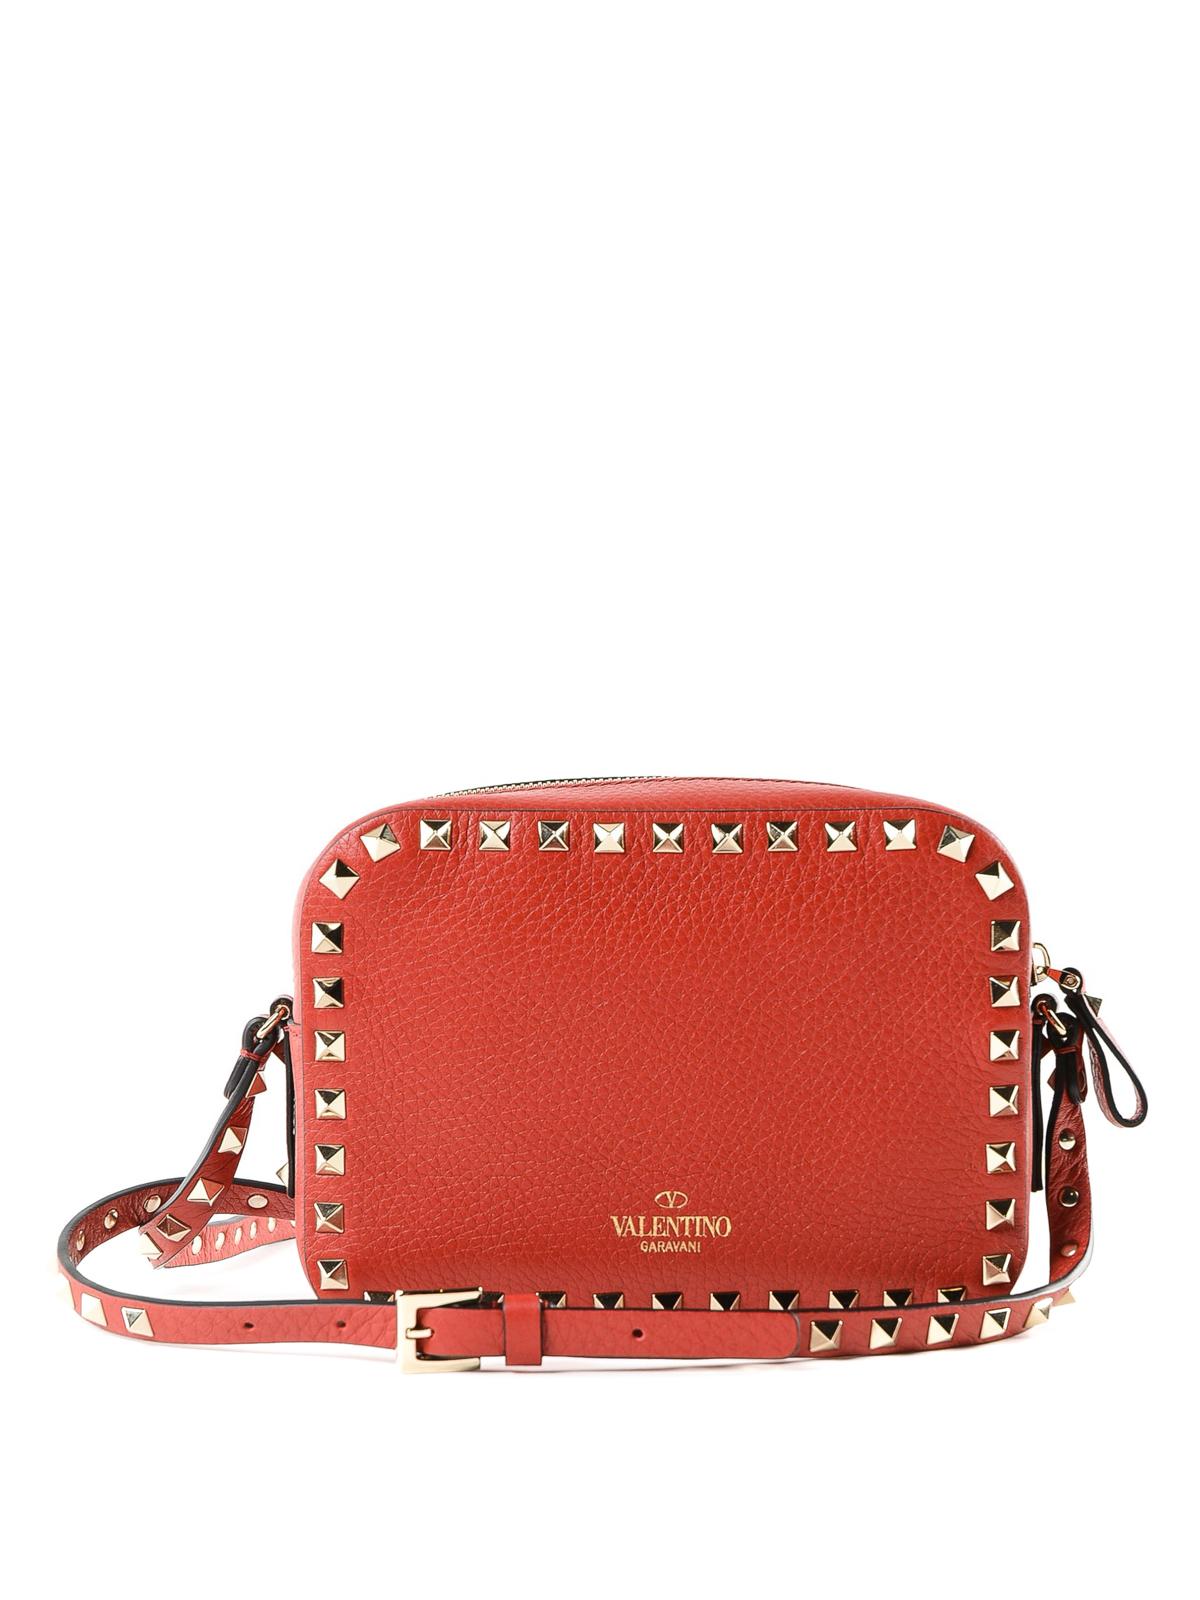 535330a52b5a iKRIX VALENTINO GARAVANI  shoulder bags - Red Rockstud leather camera bag